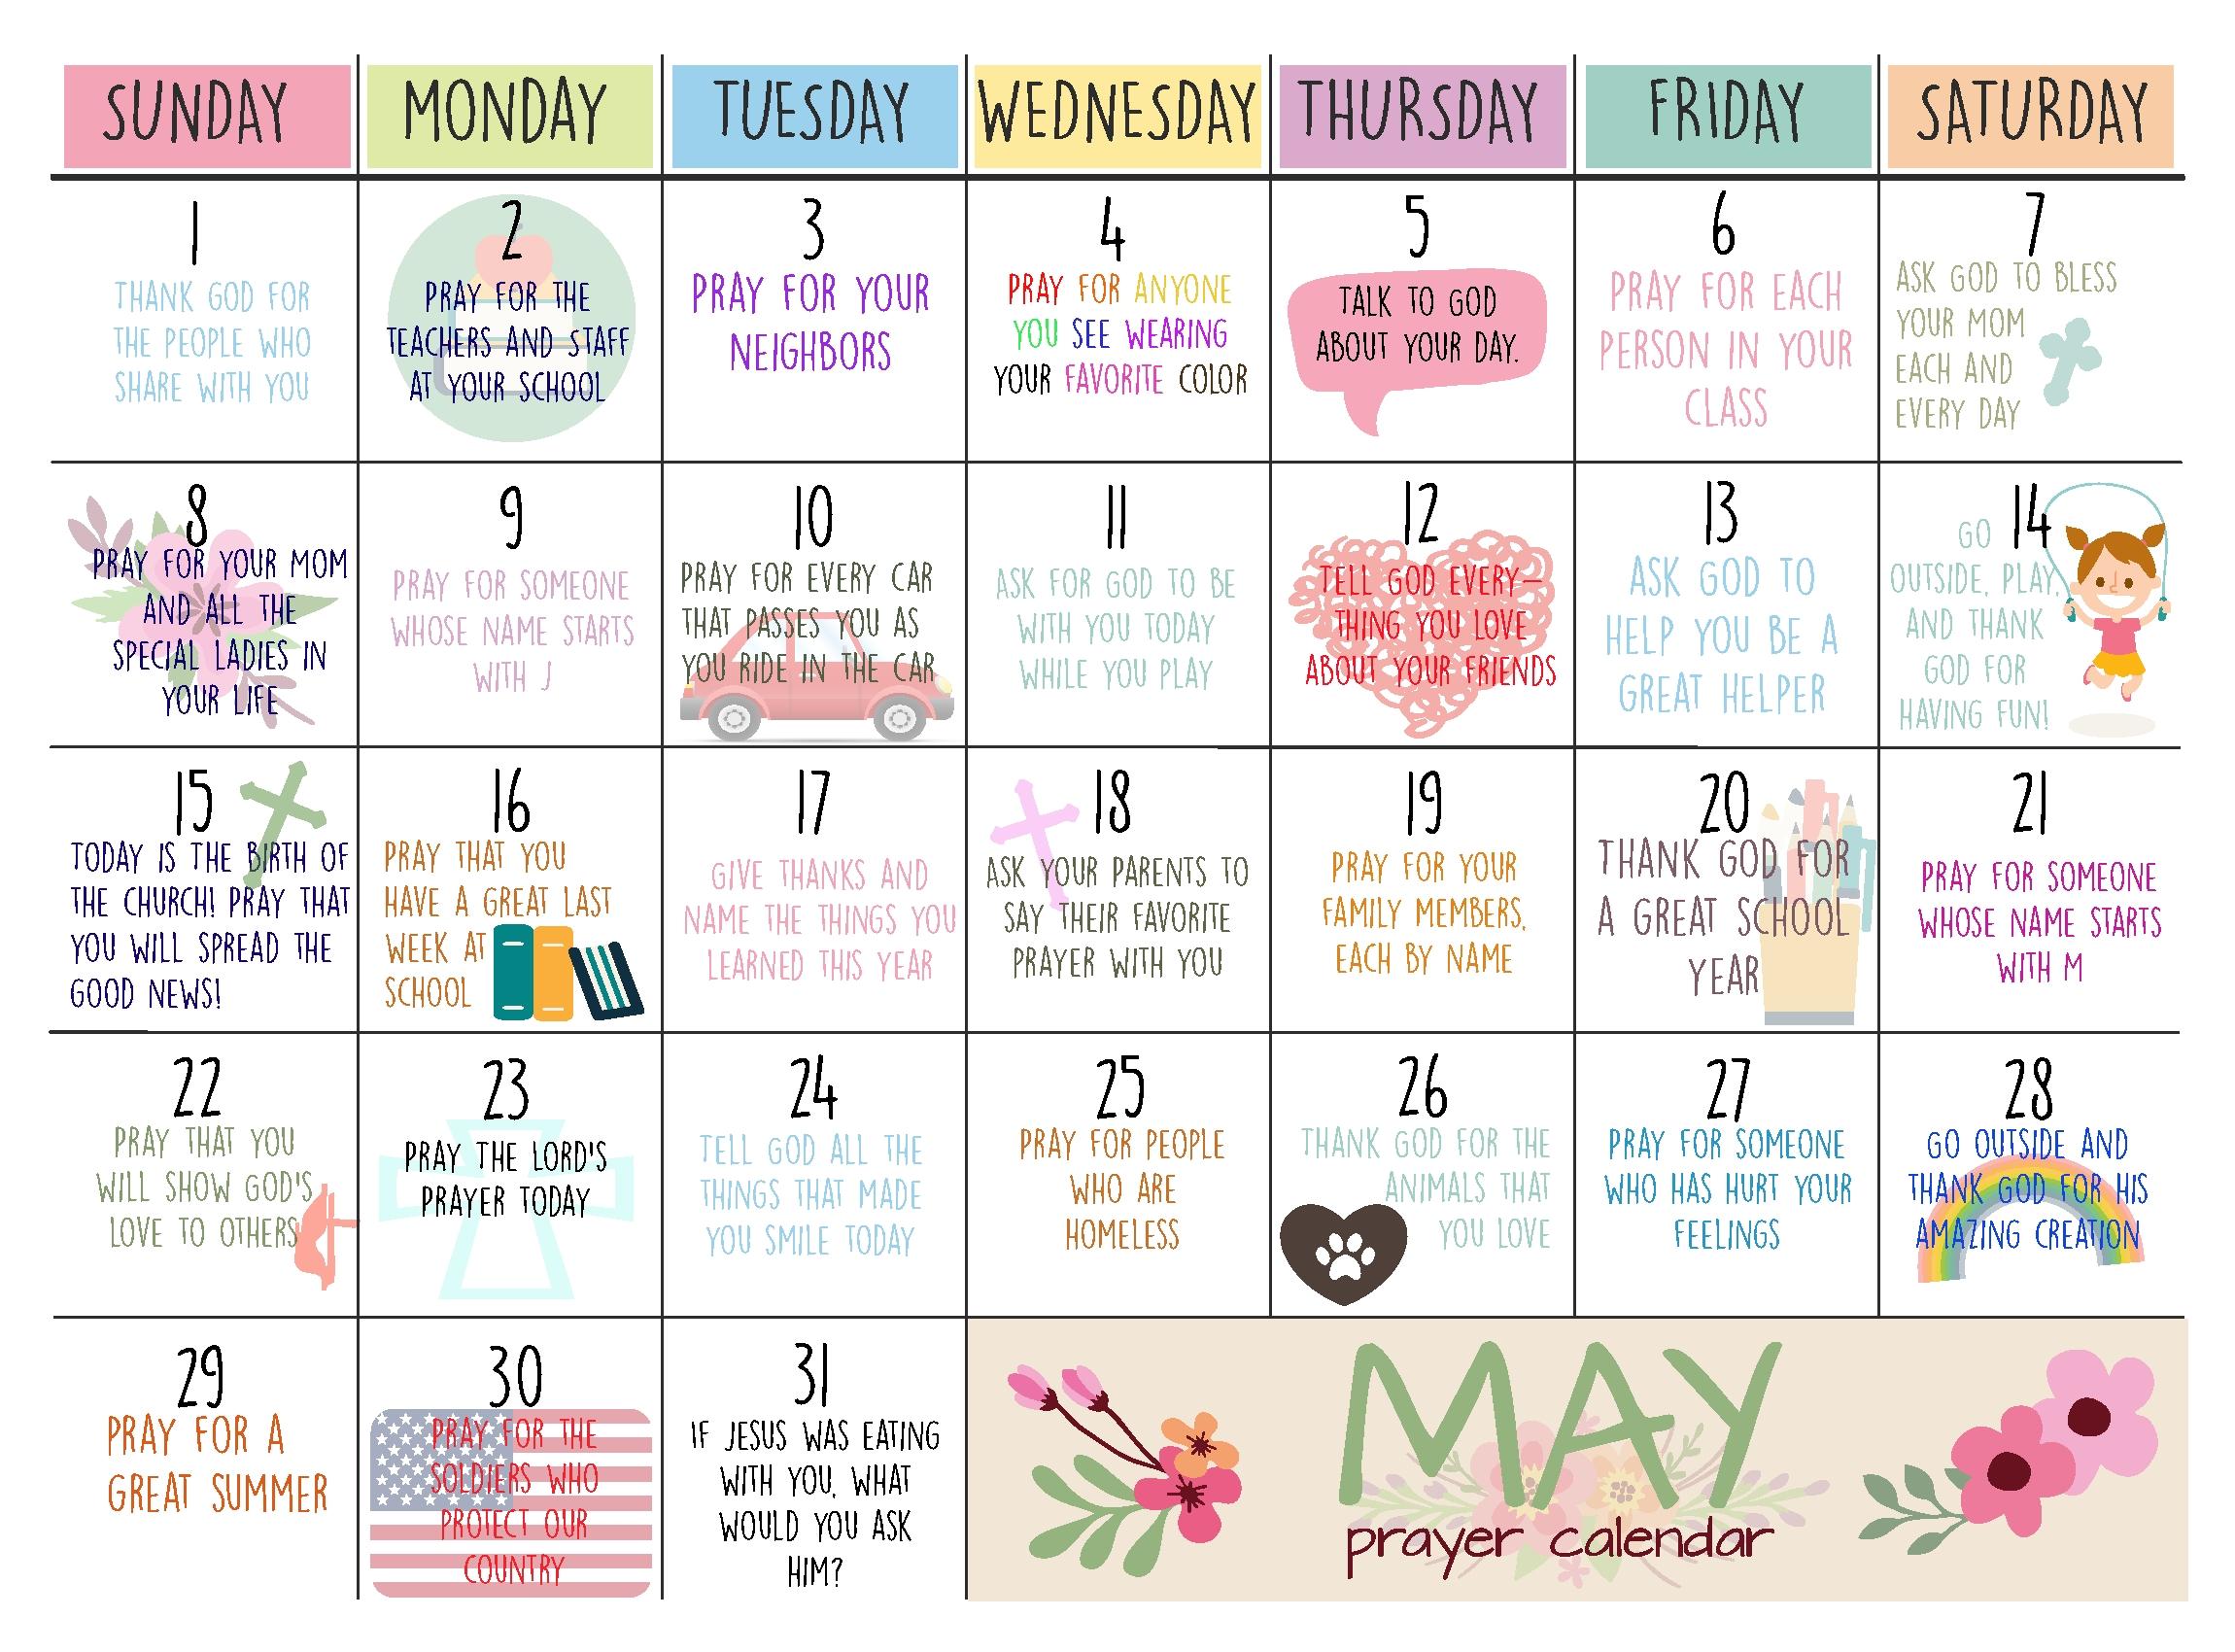 May Prayer Calendar For Kids, Prayer Calendar, Prayer